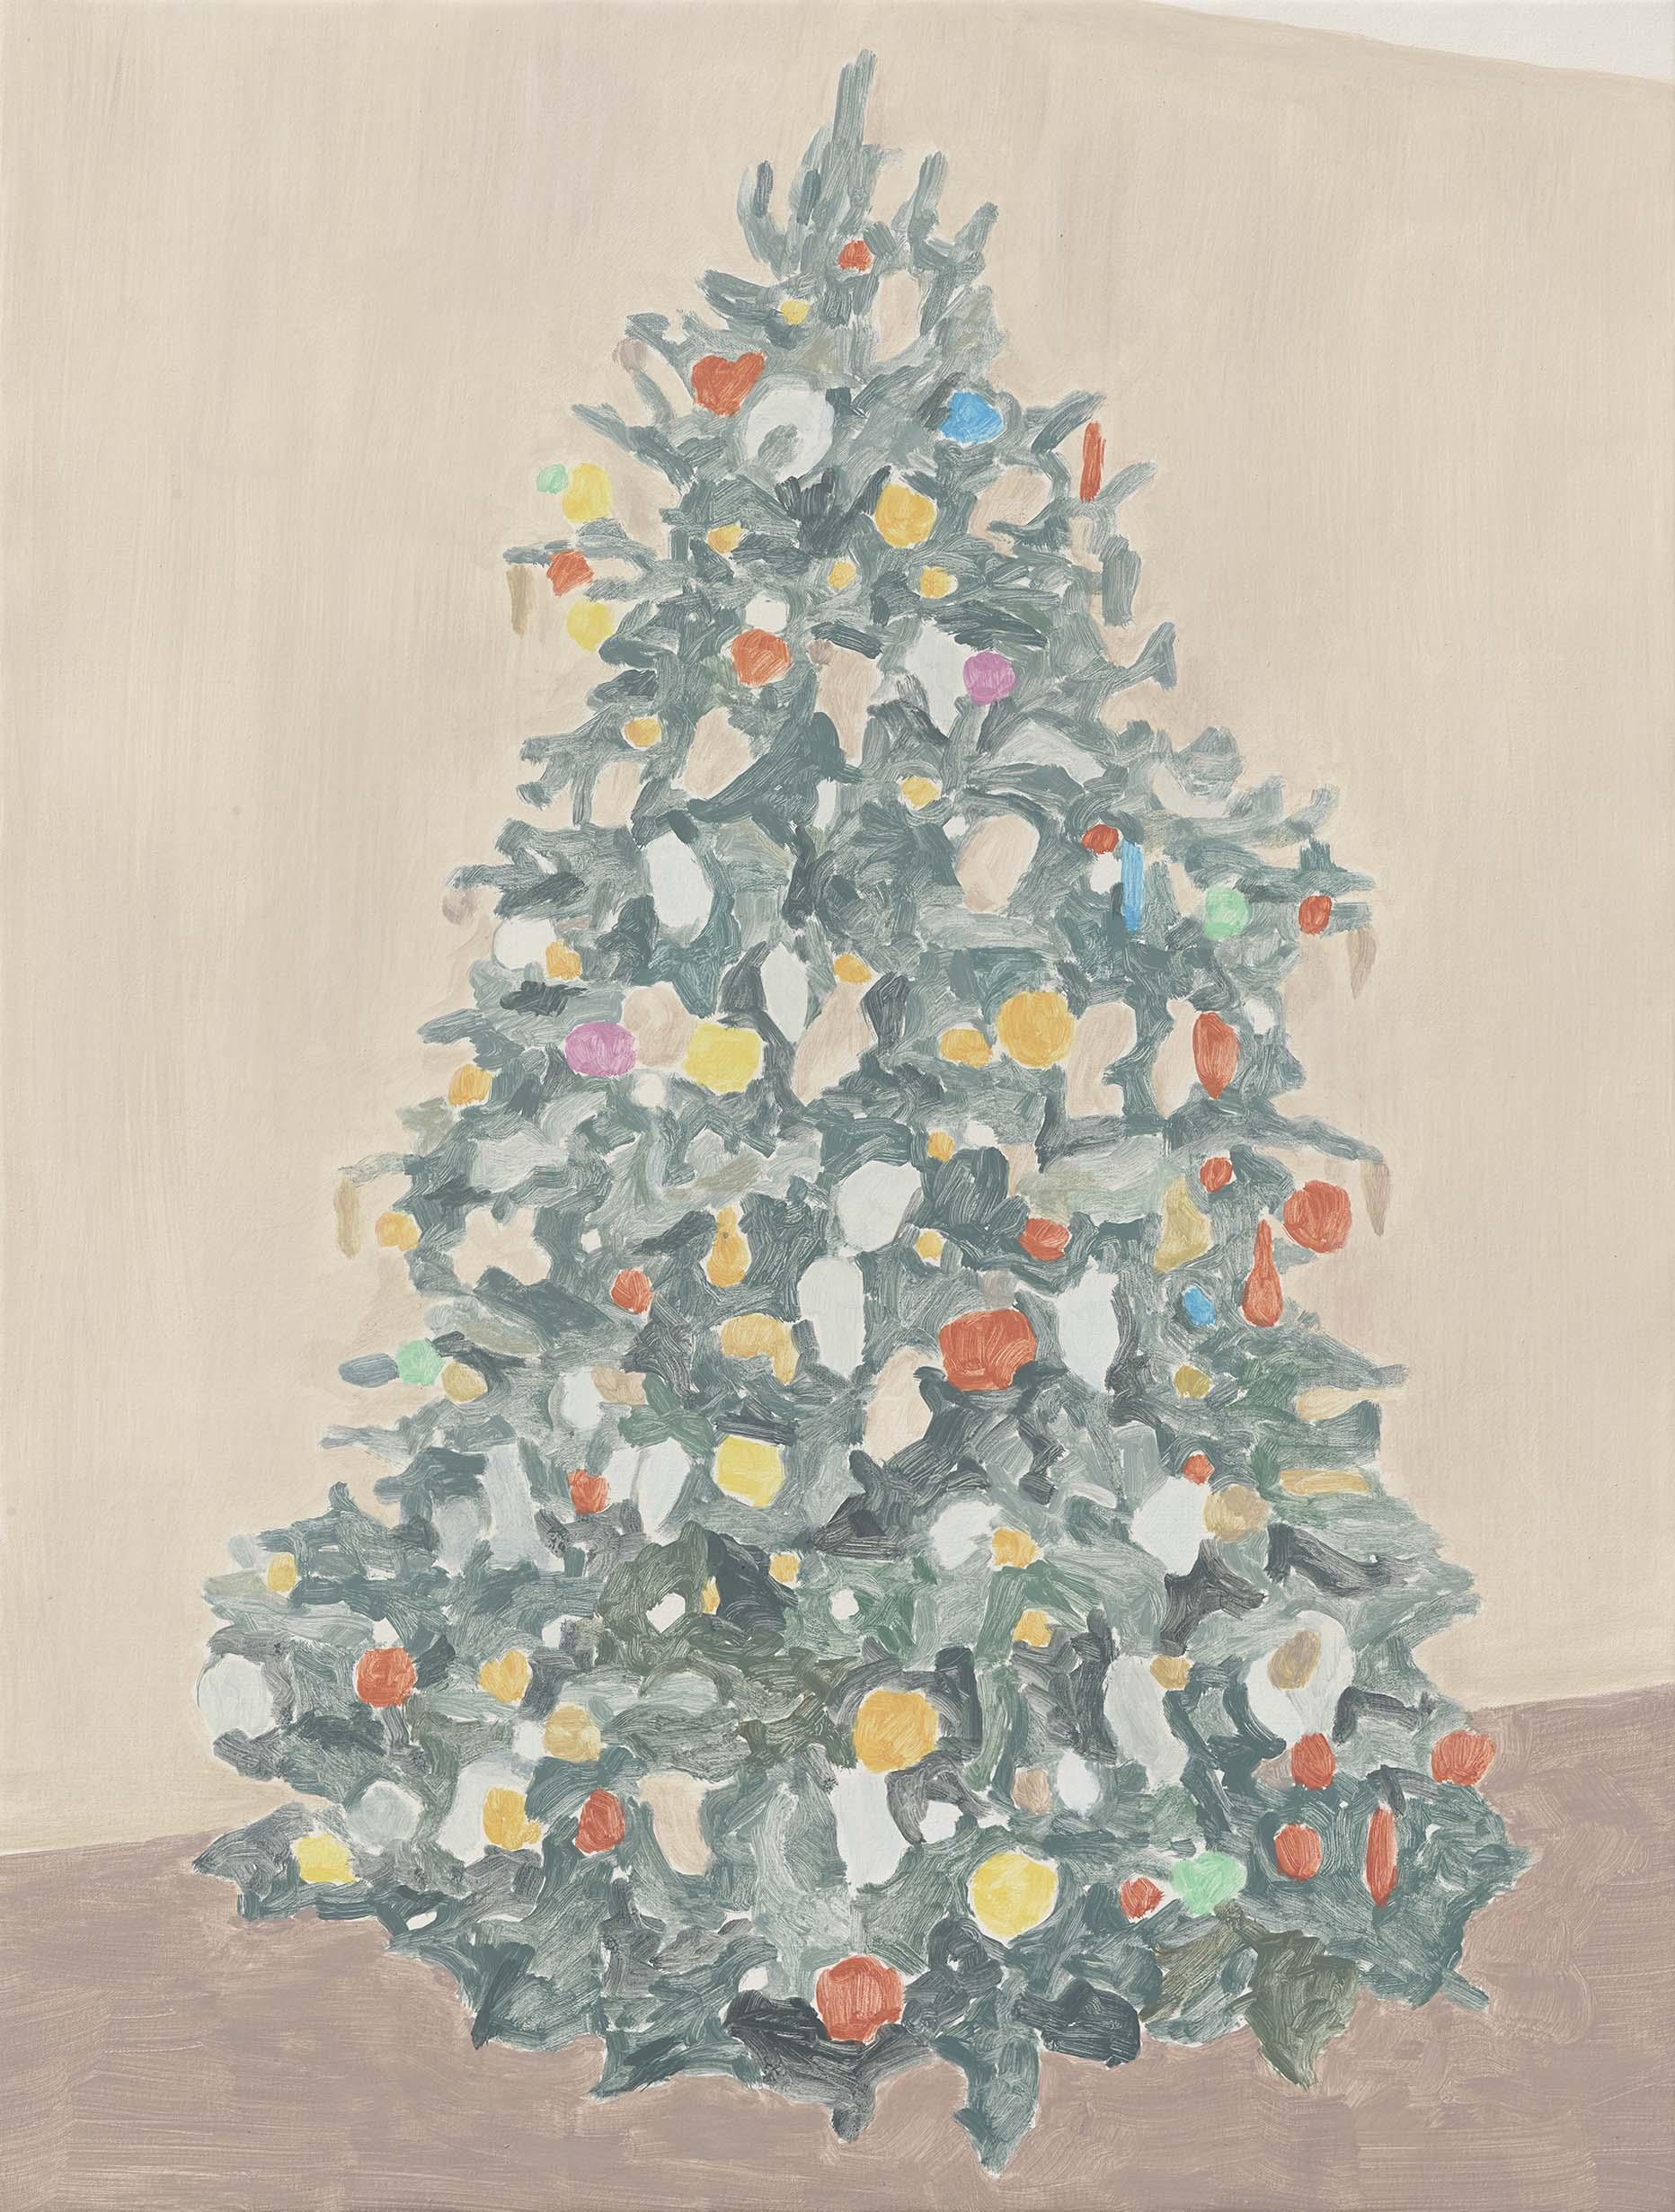 Xmas Tree (majestic), acrylic on canvas, 32 x 24.25 inches, 2015.